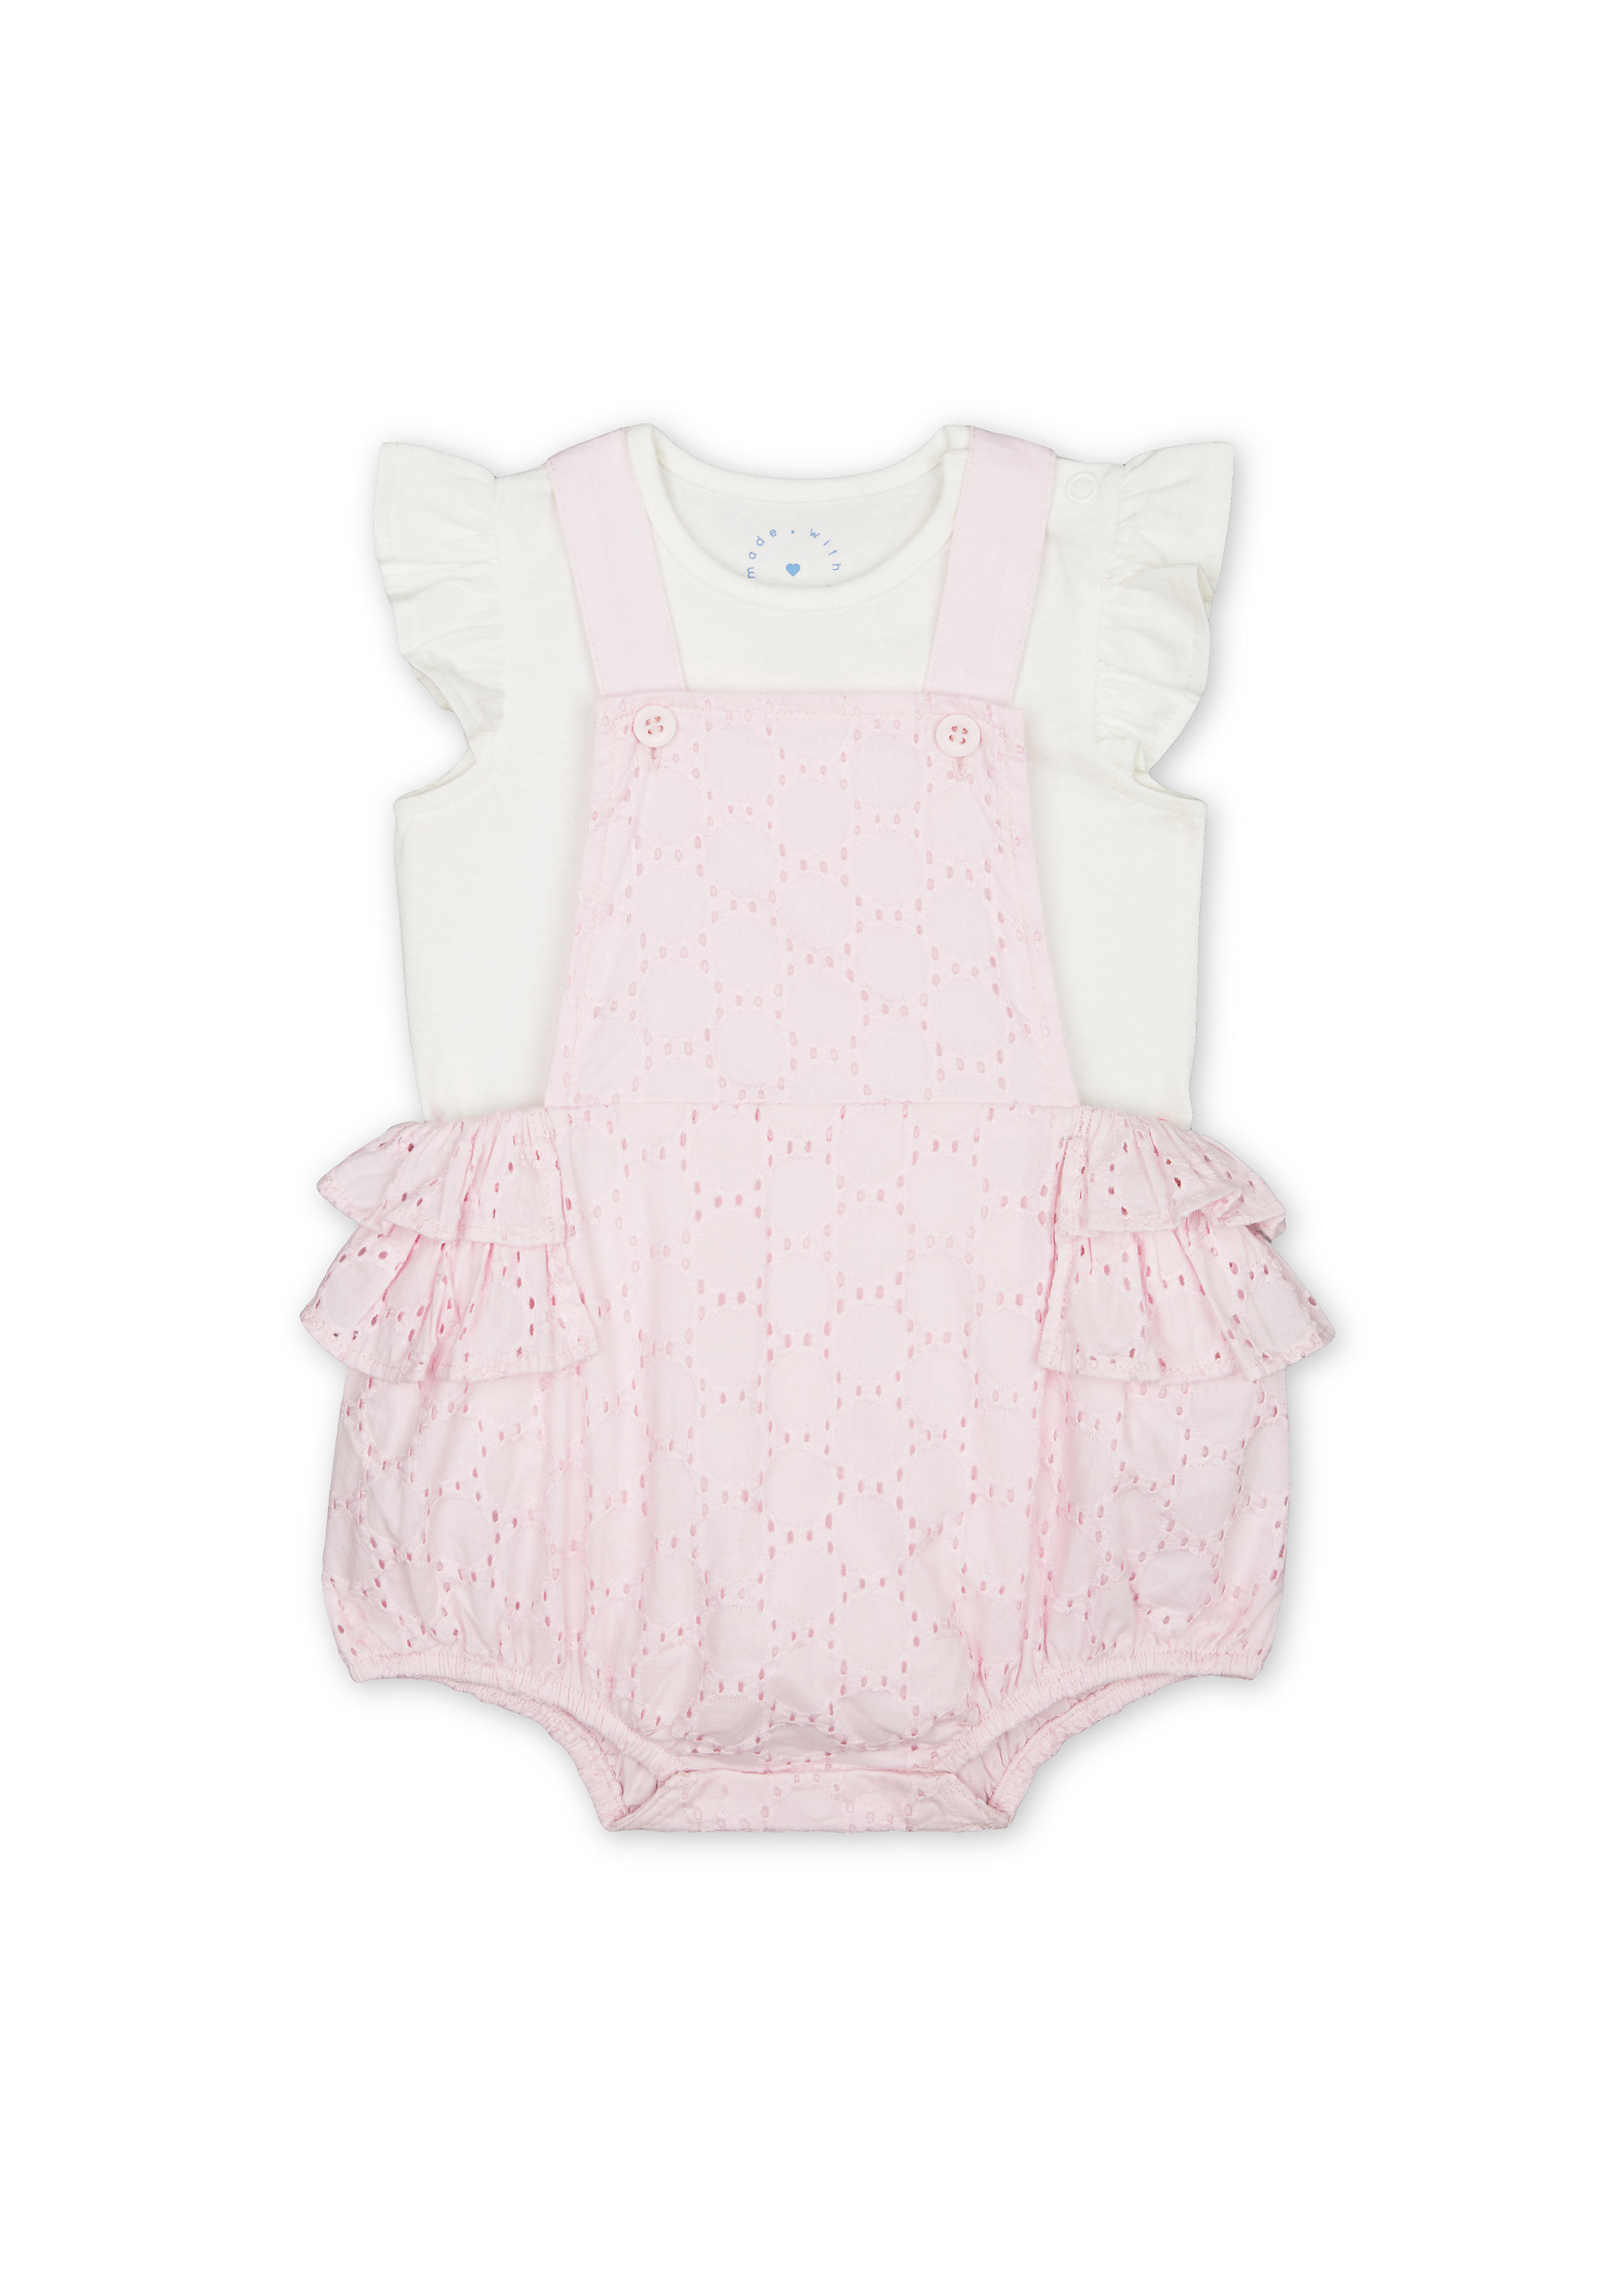 Mothercare   Girls Half Sleeves Schiffli Dungaree Set Frill Detail - Pink